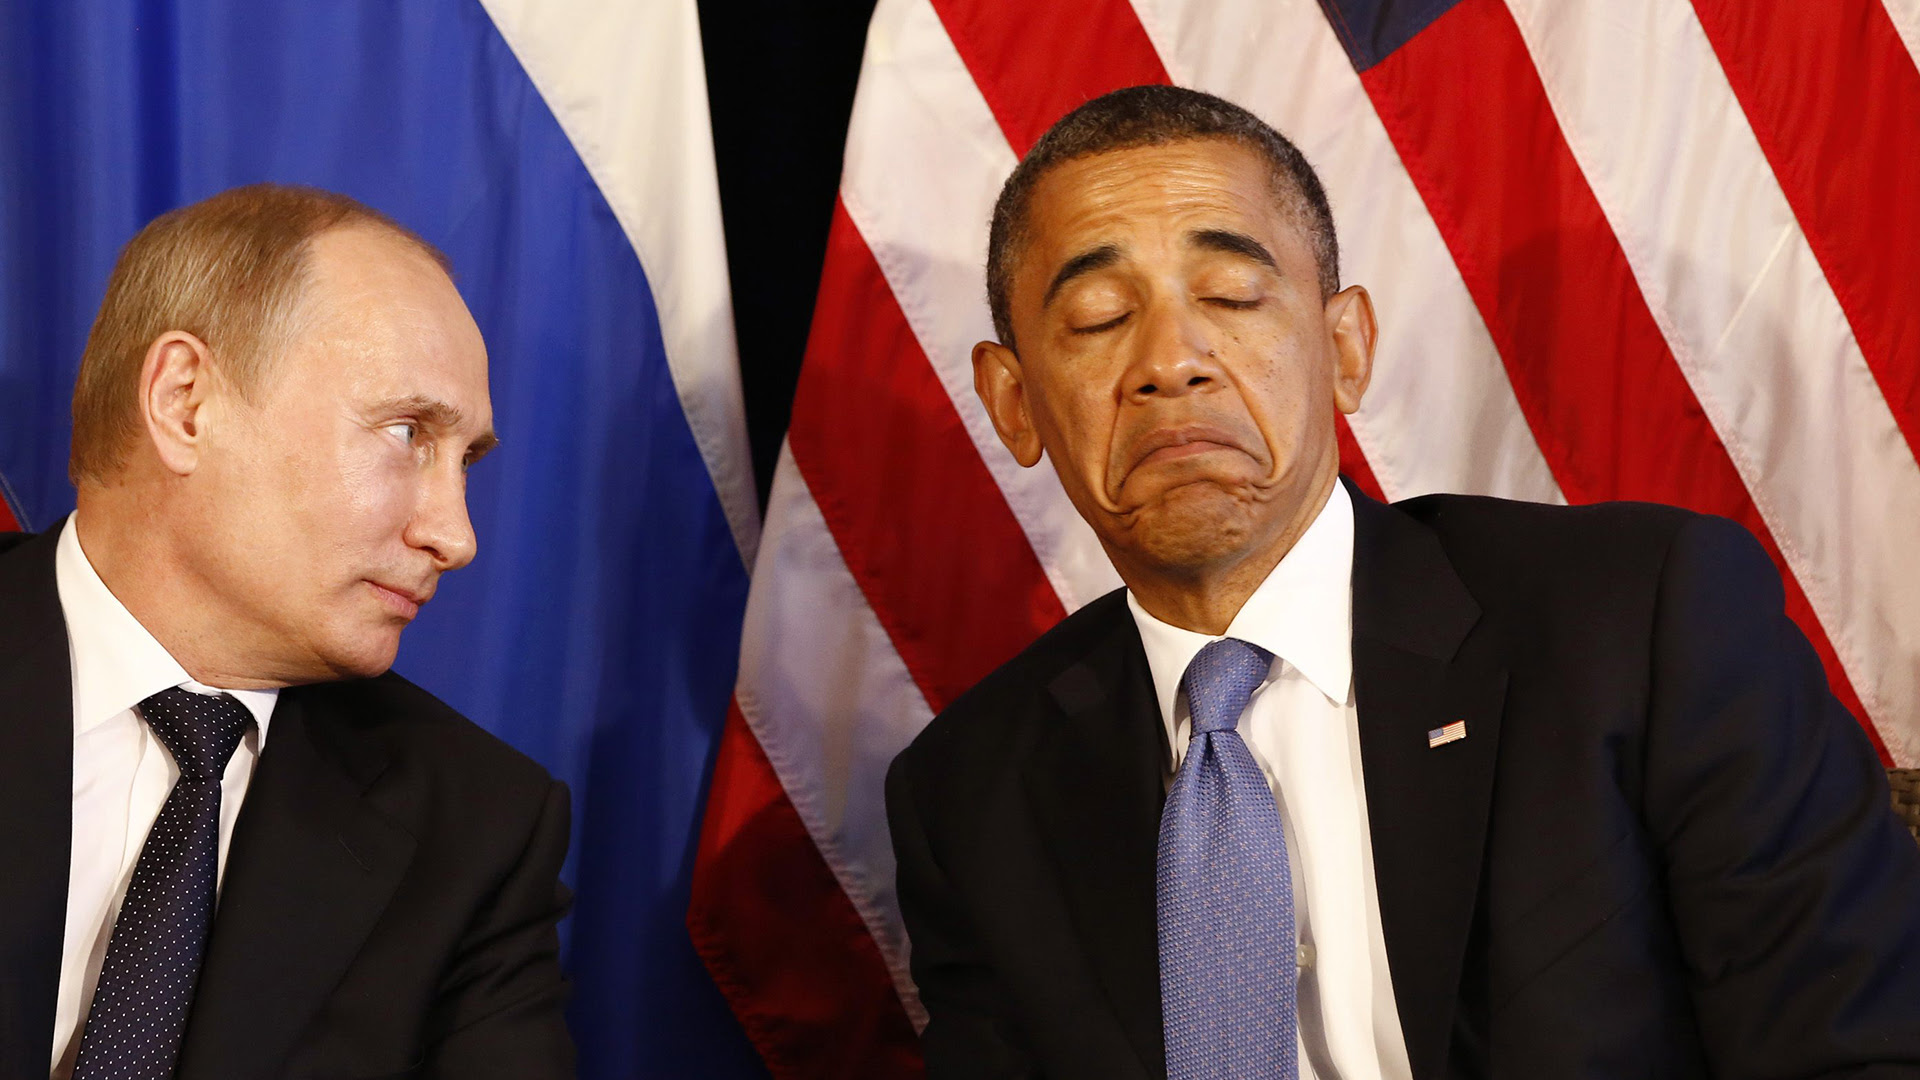 http://media2.s-nbcnews.com/i/MSNBC/Components/Video/130808/f_obama_putin2_130808.jpg